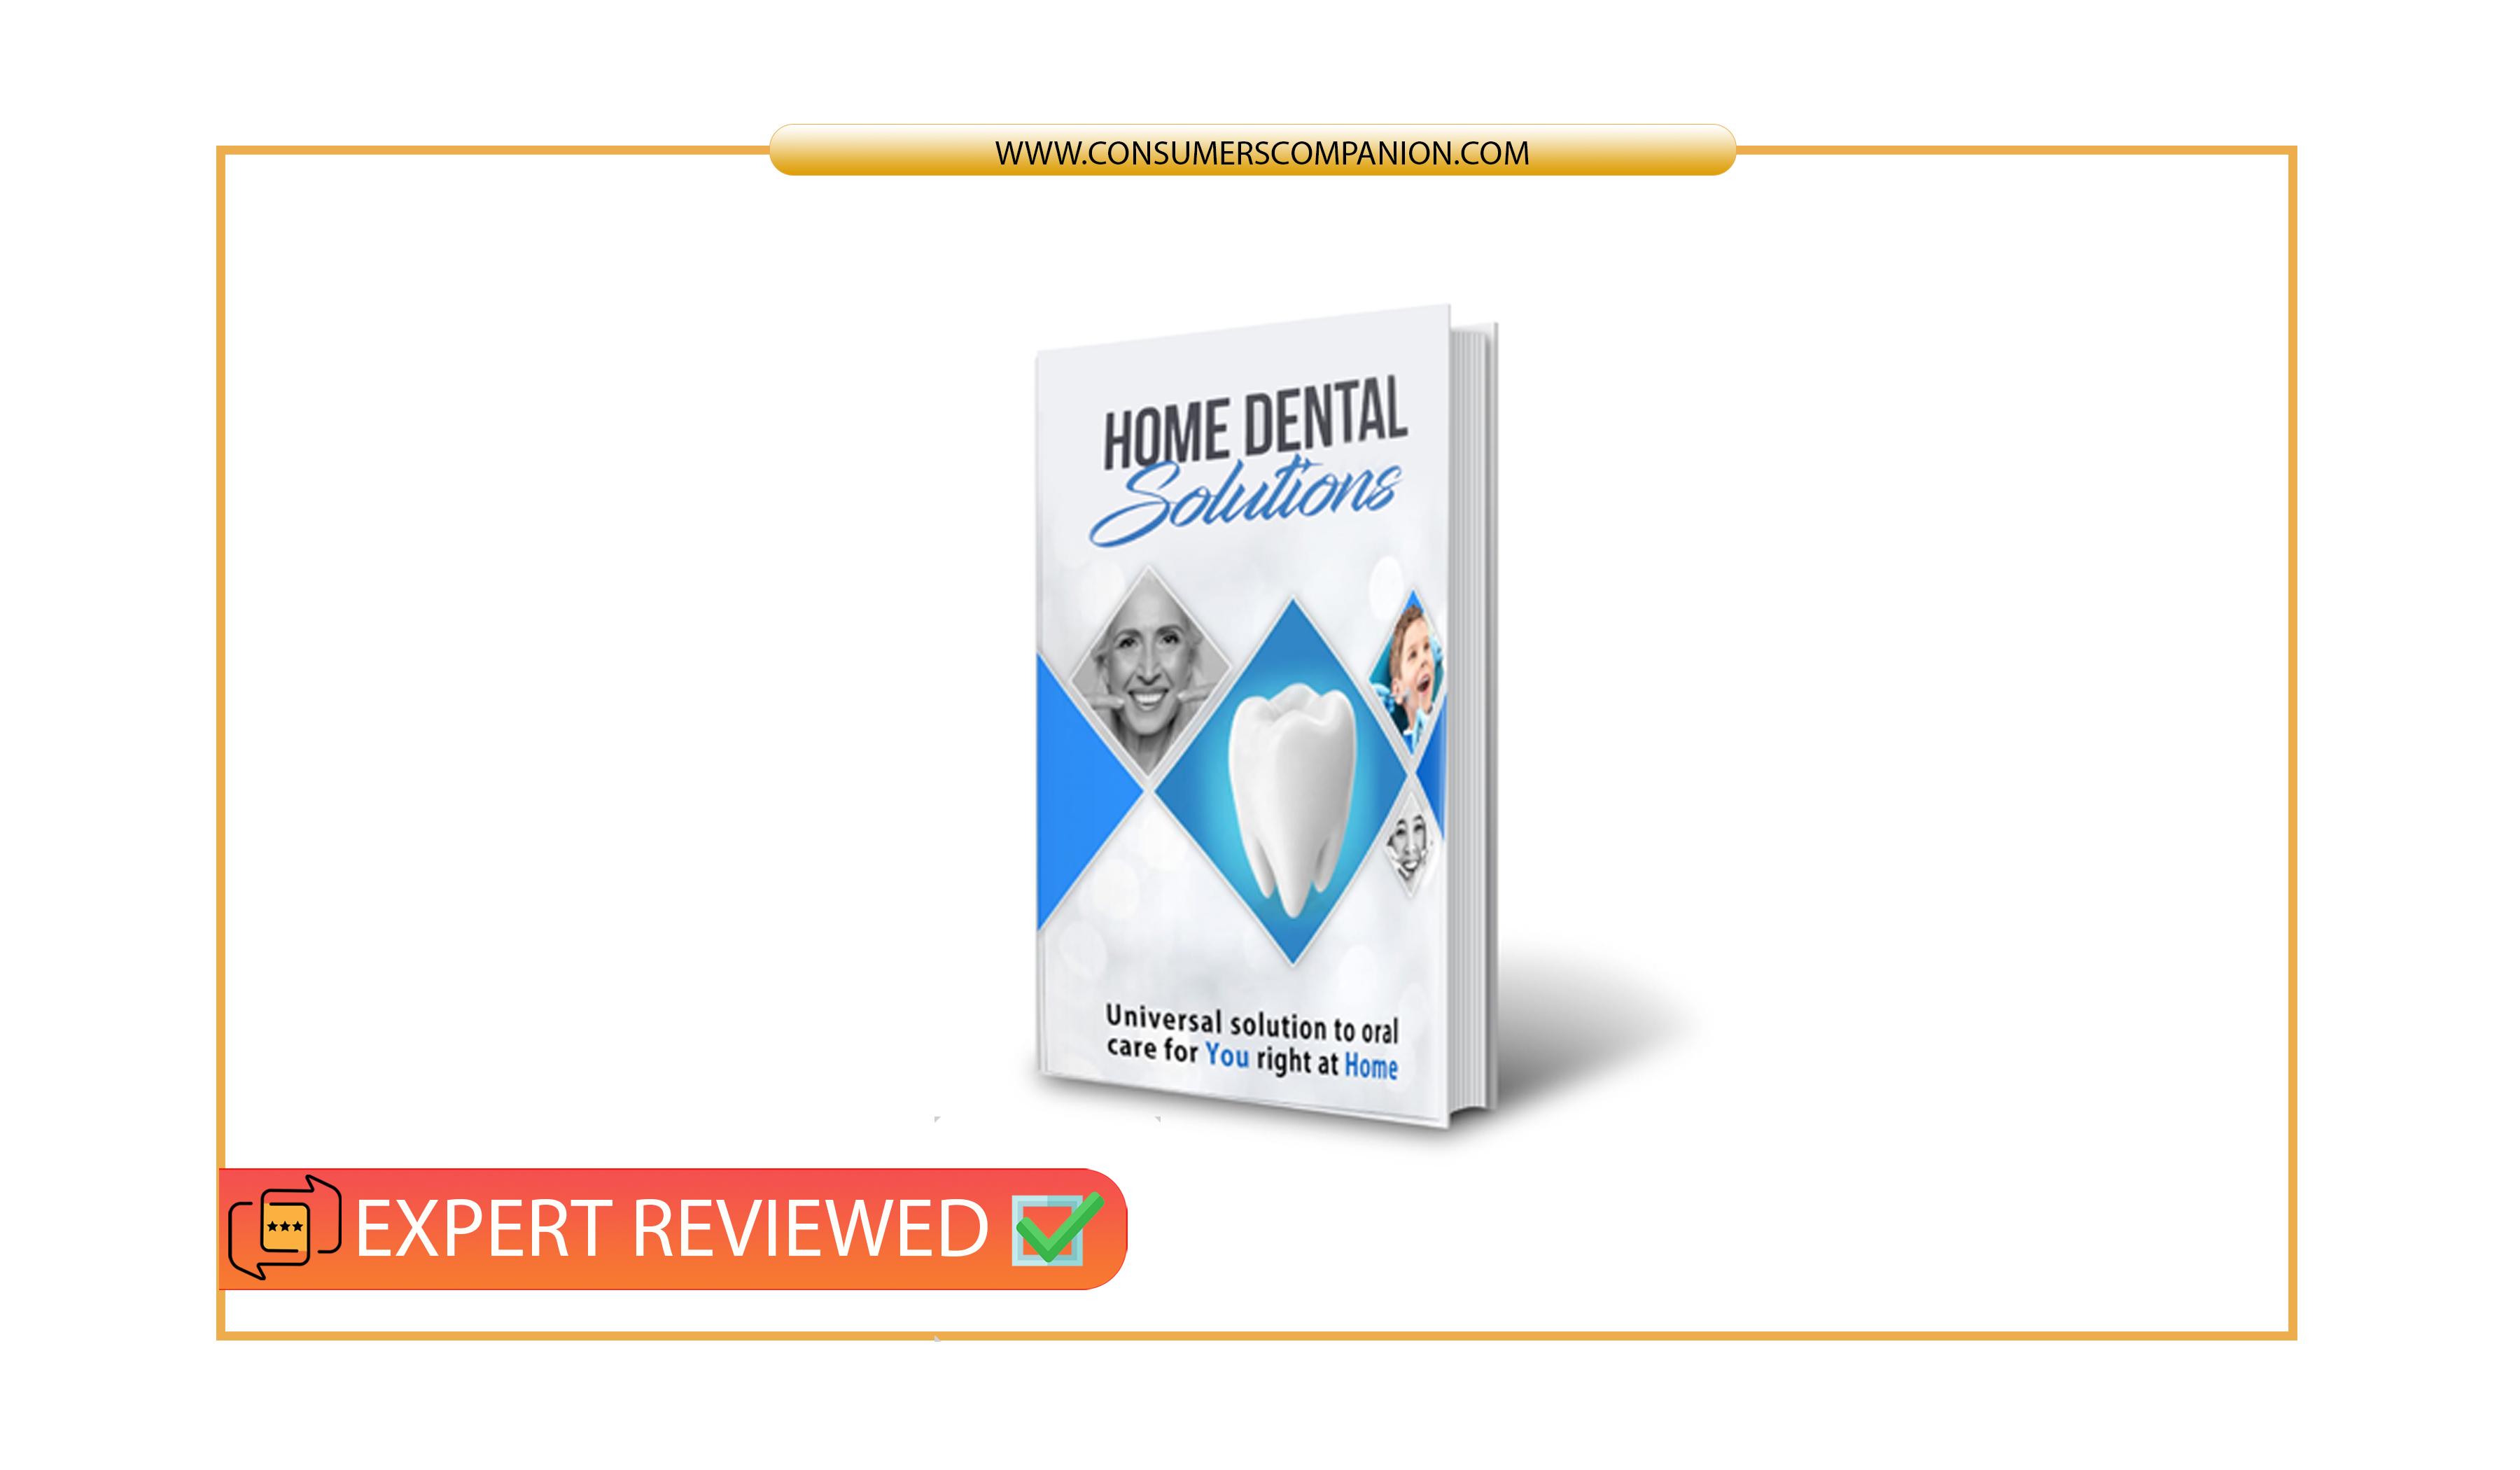 Home Dental Solutions Reviews